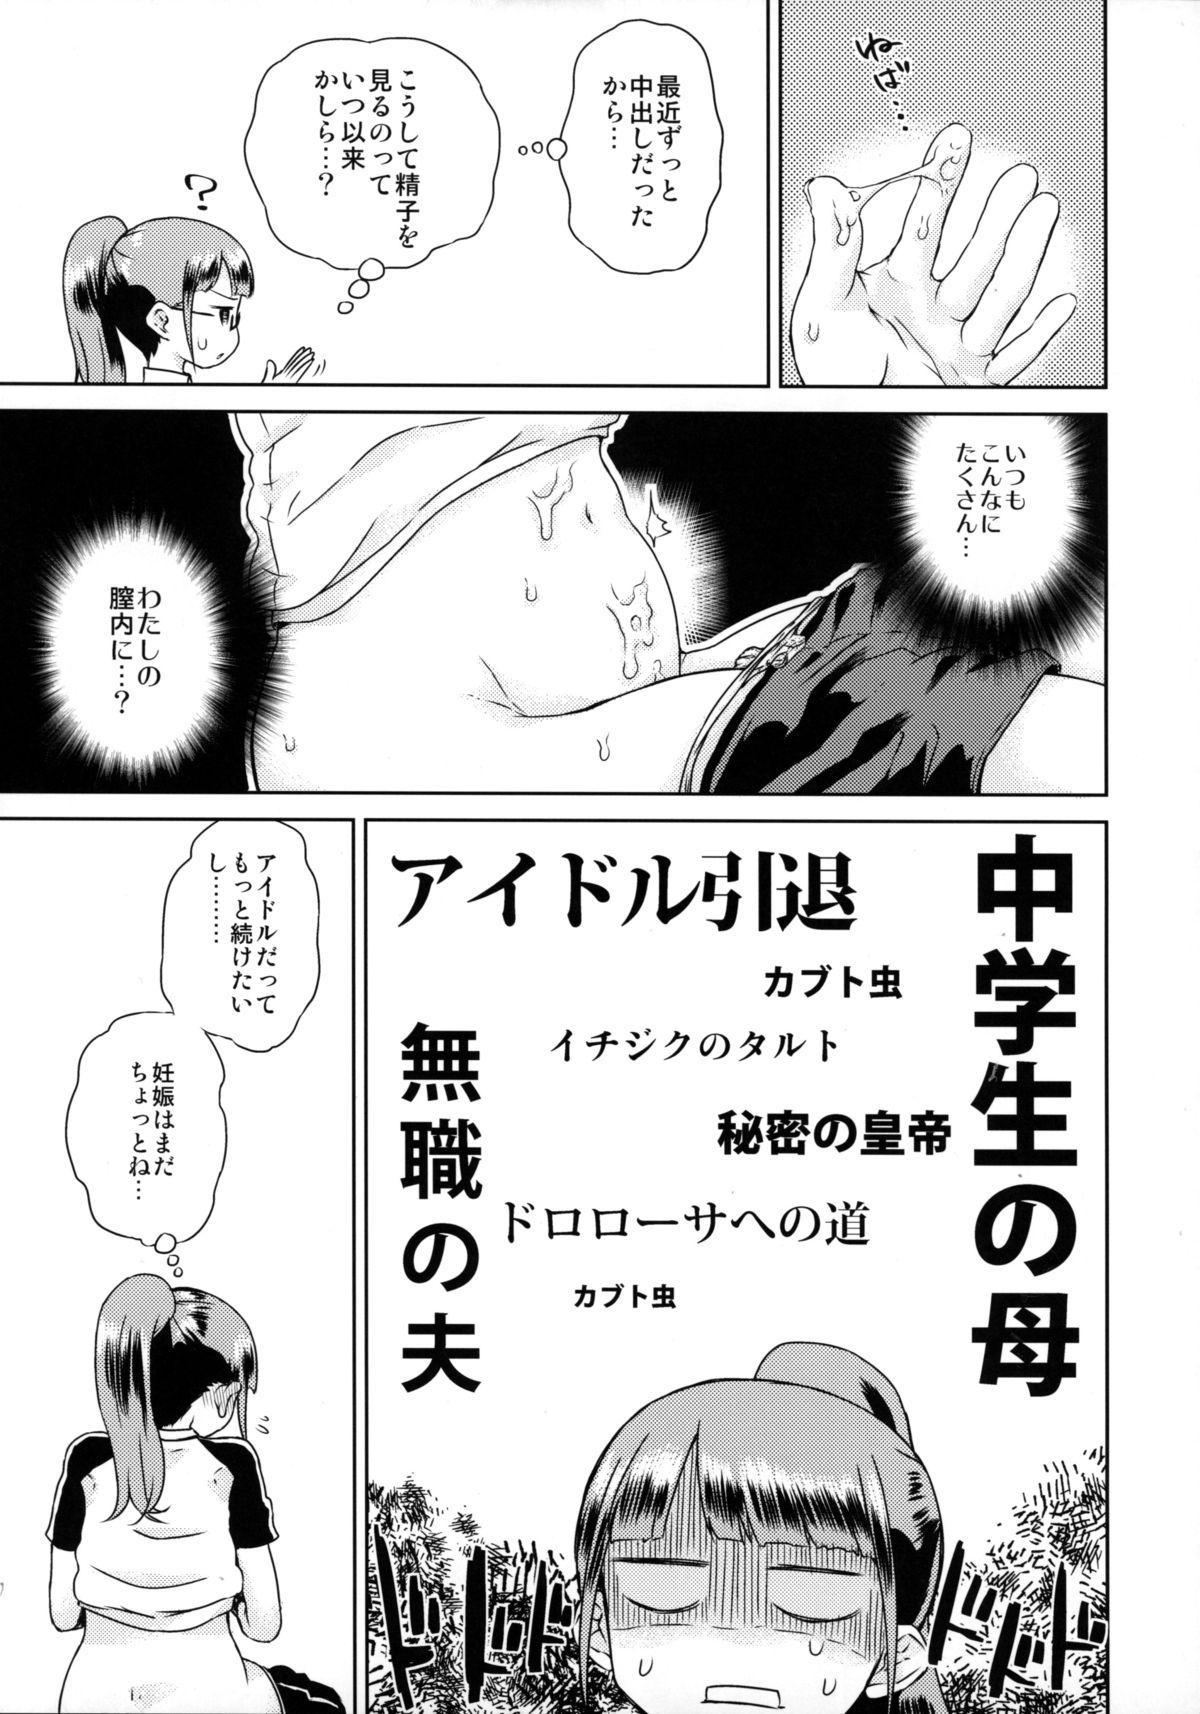 Mirei-chan to Love Love 2 9